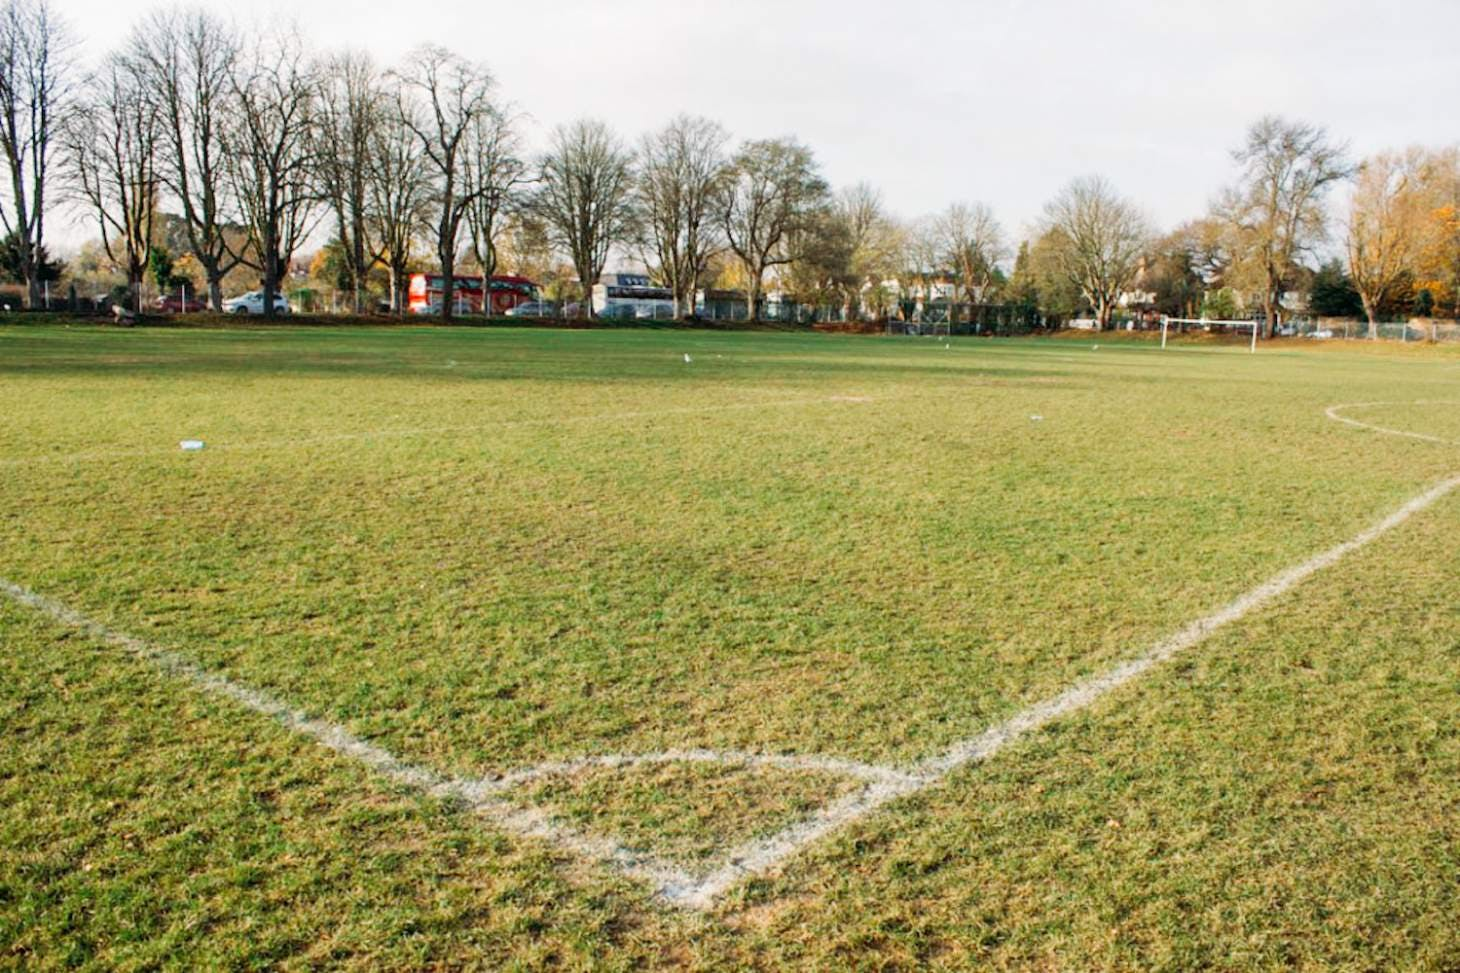 Chiswick School 11 a side | Grass football pitch